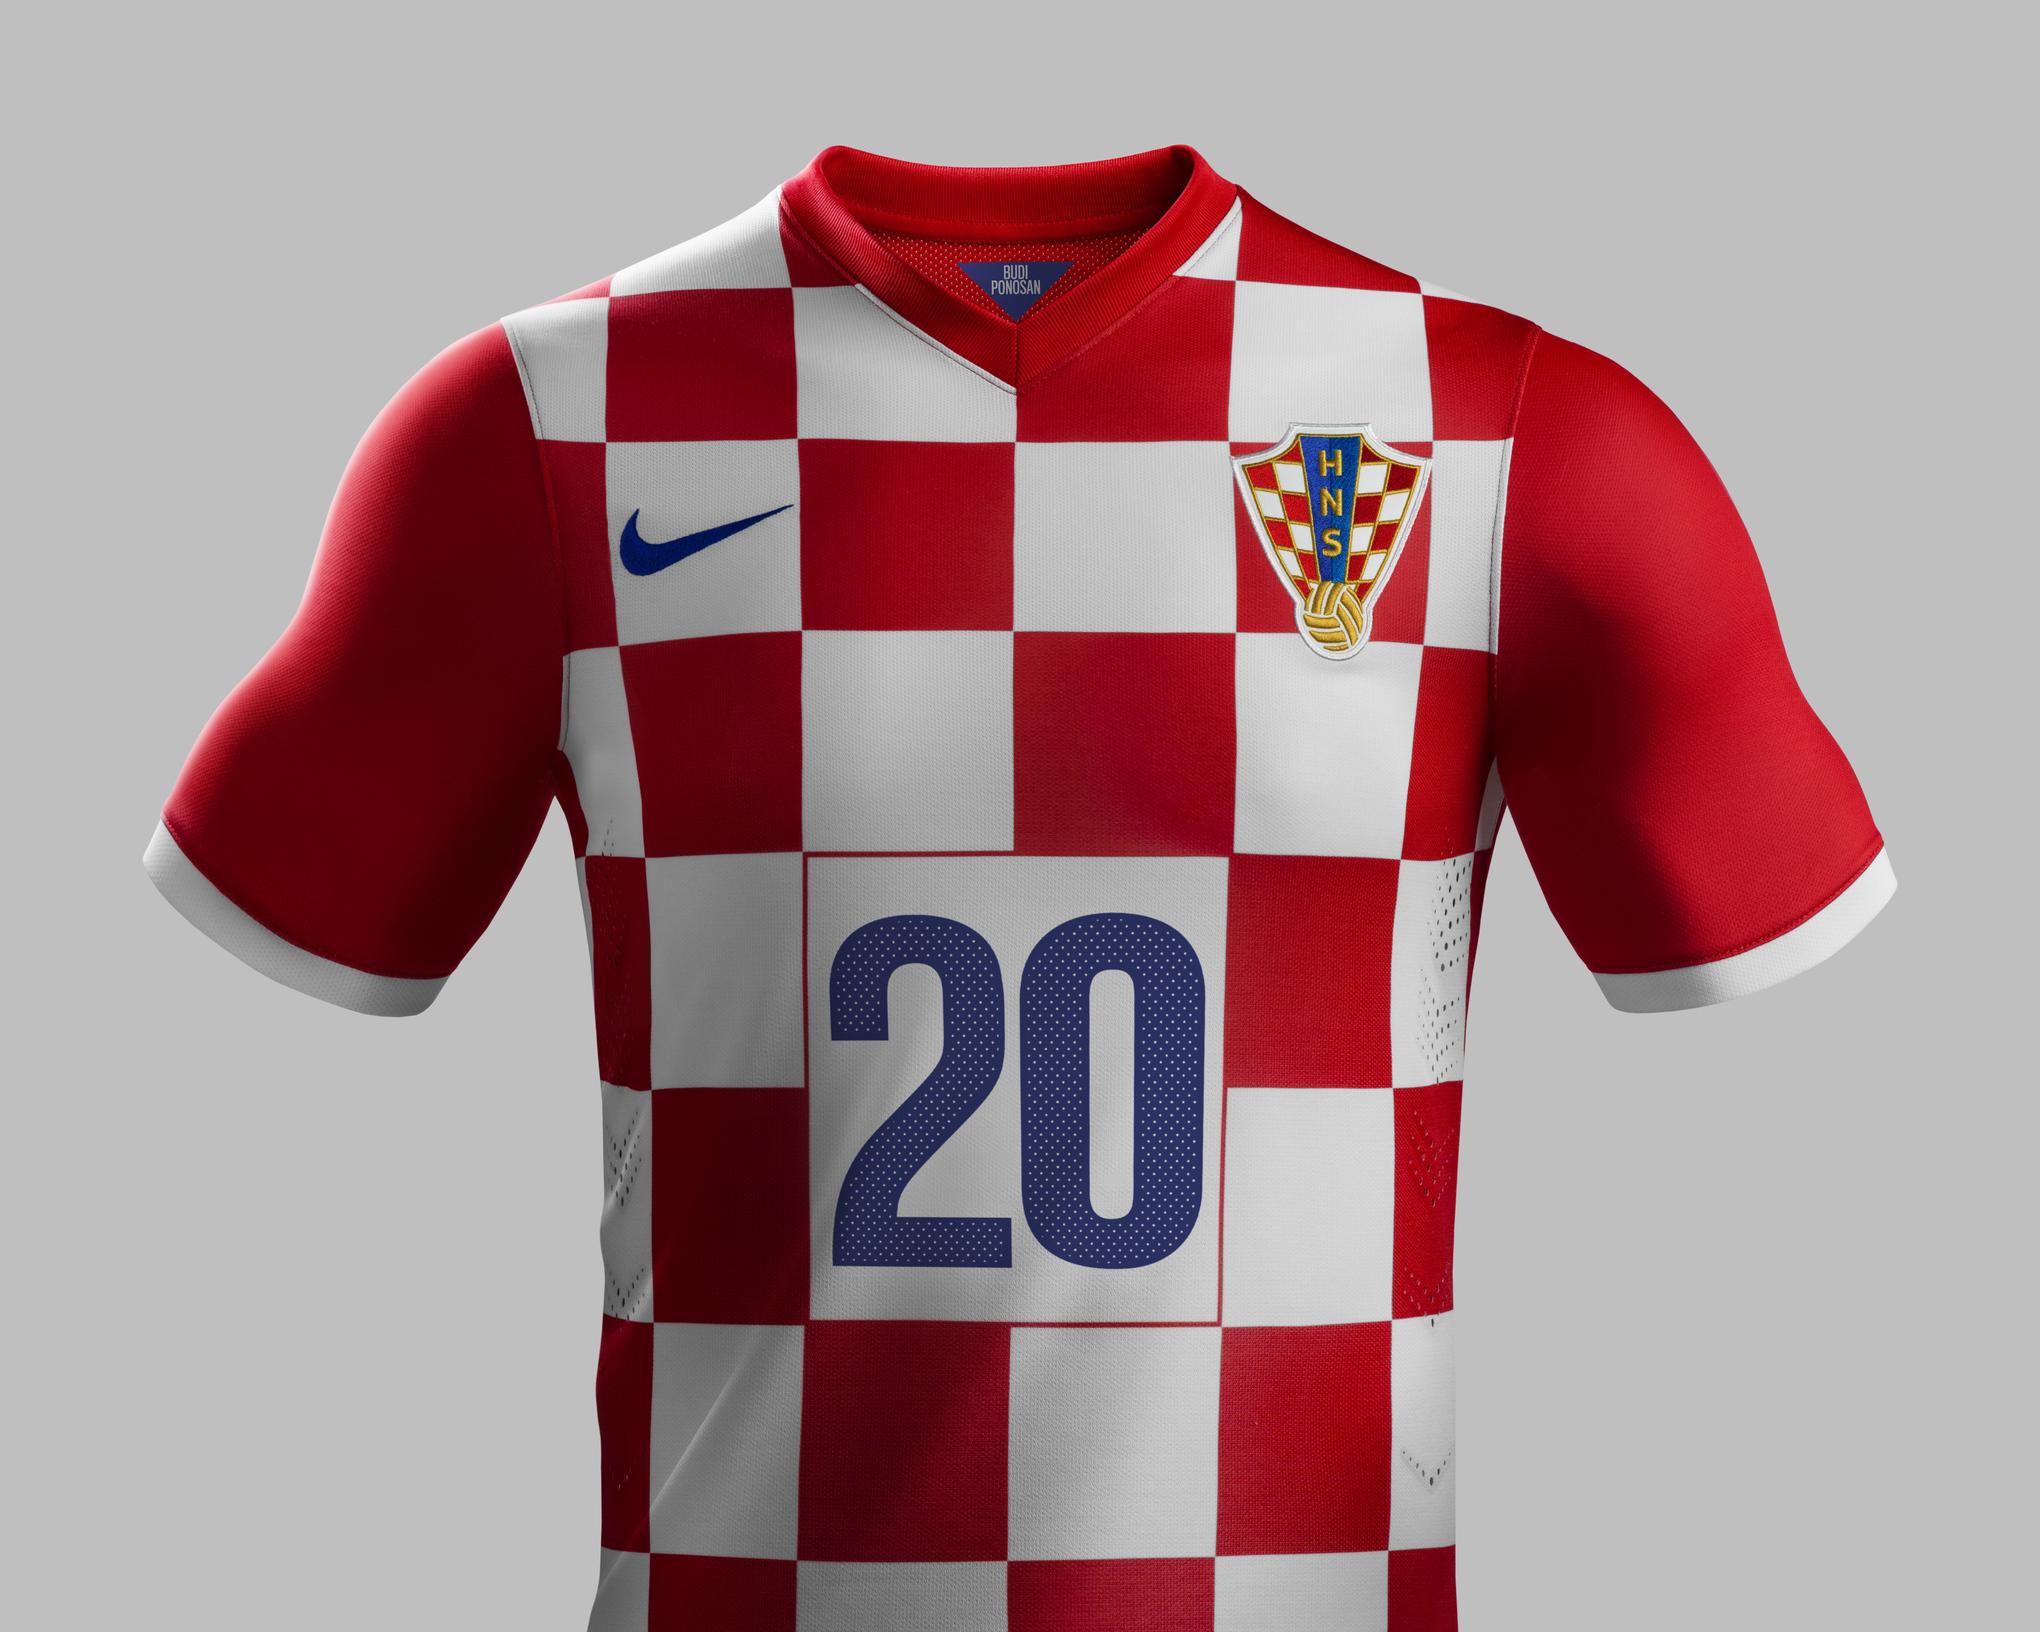 Nikie_croatia_home_kit_3_original_medium